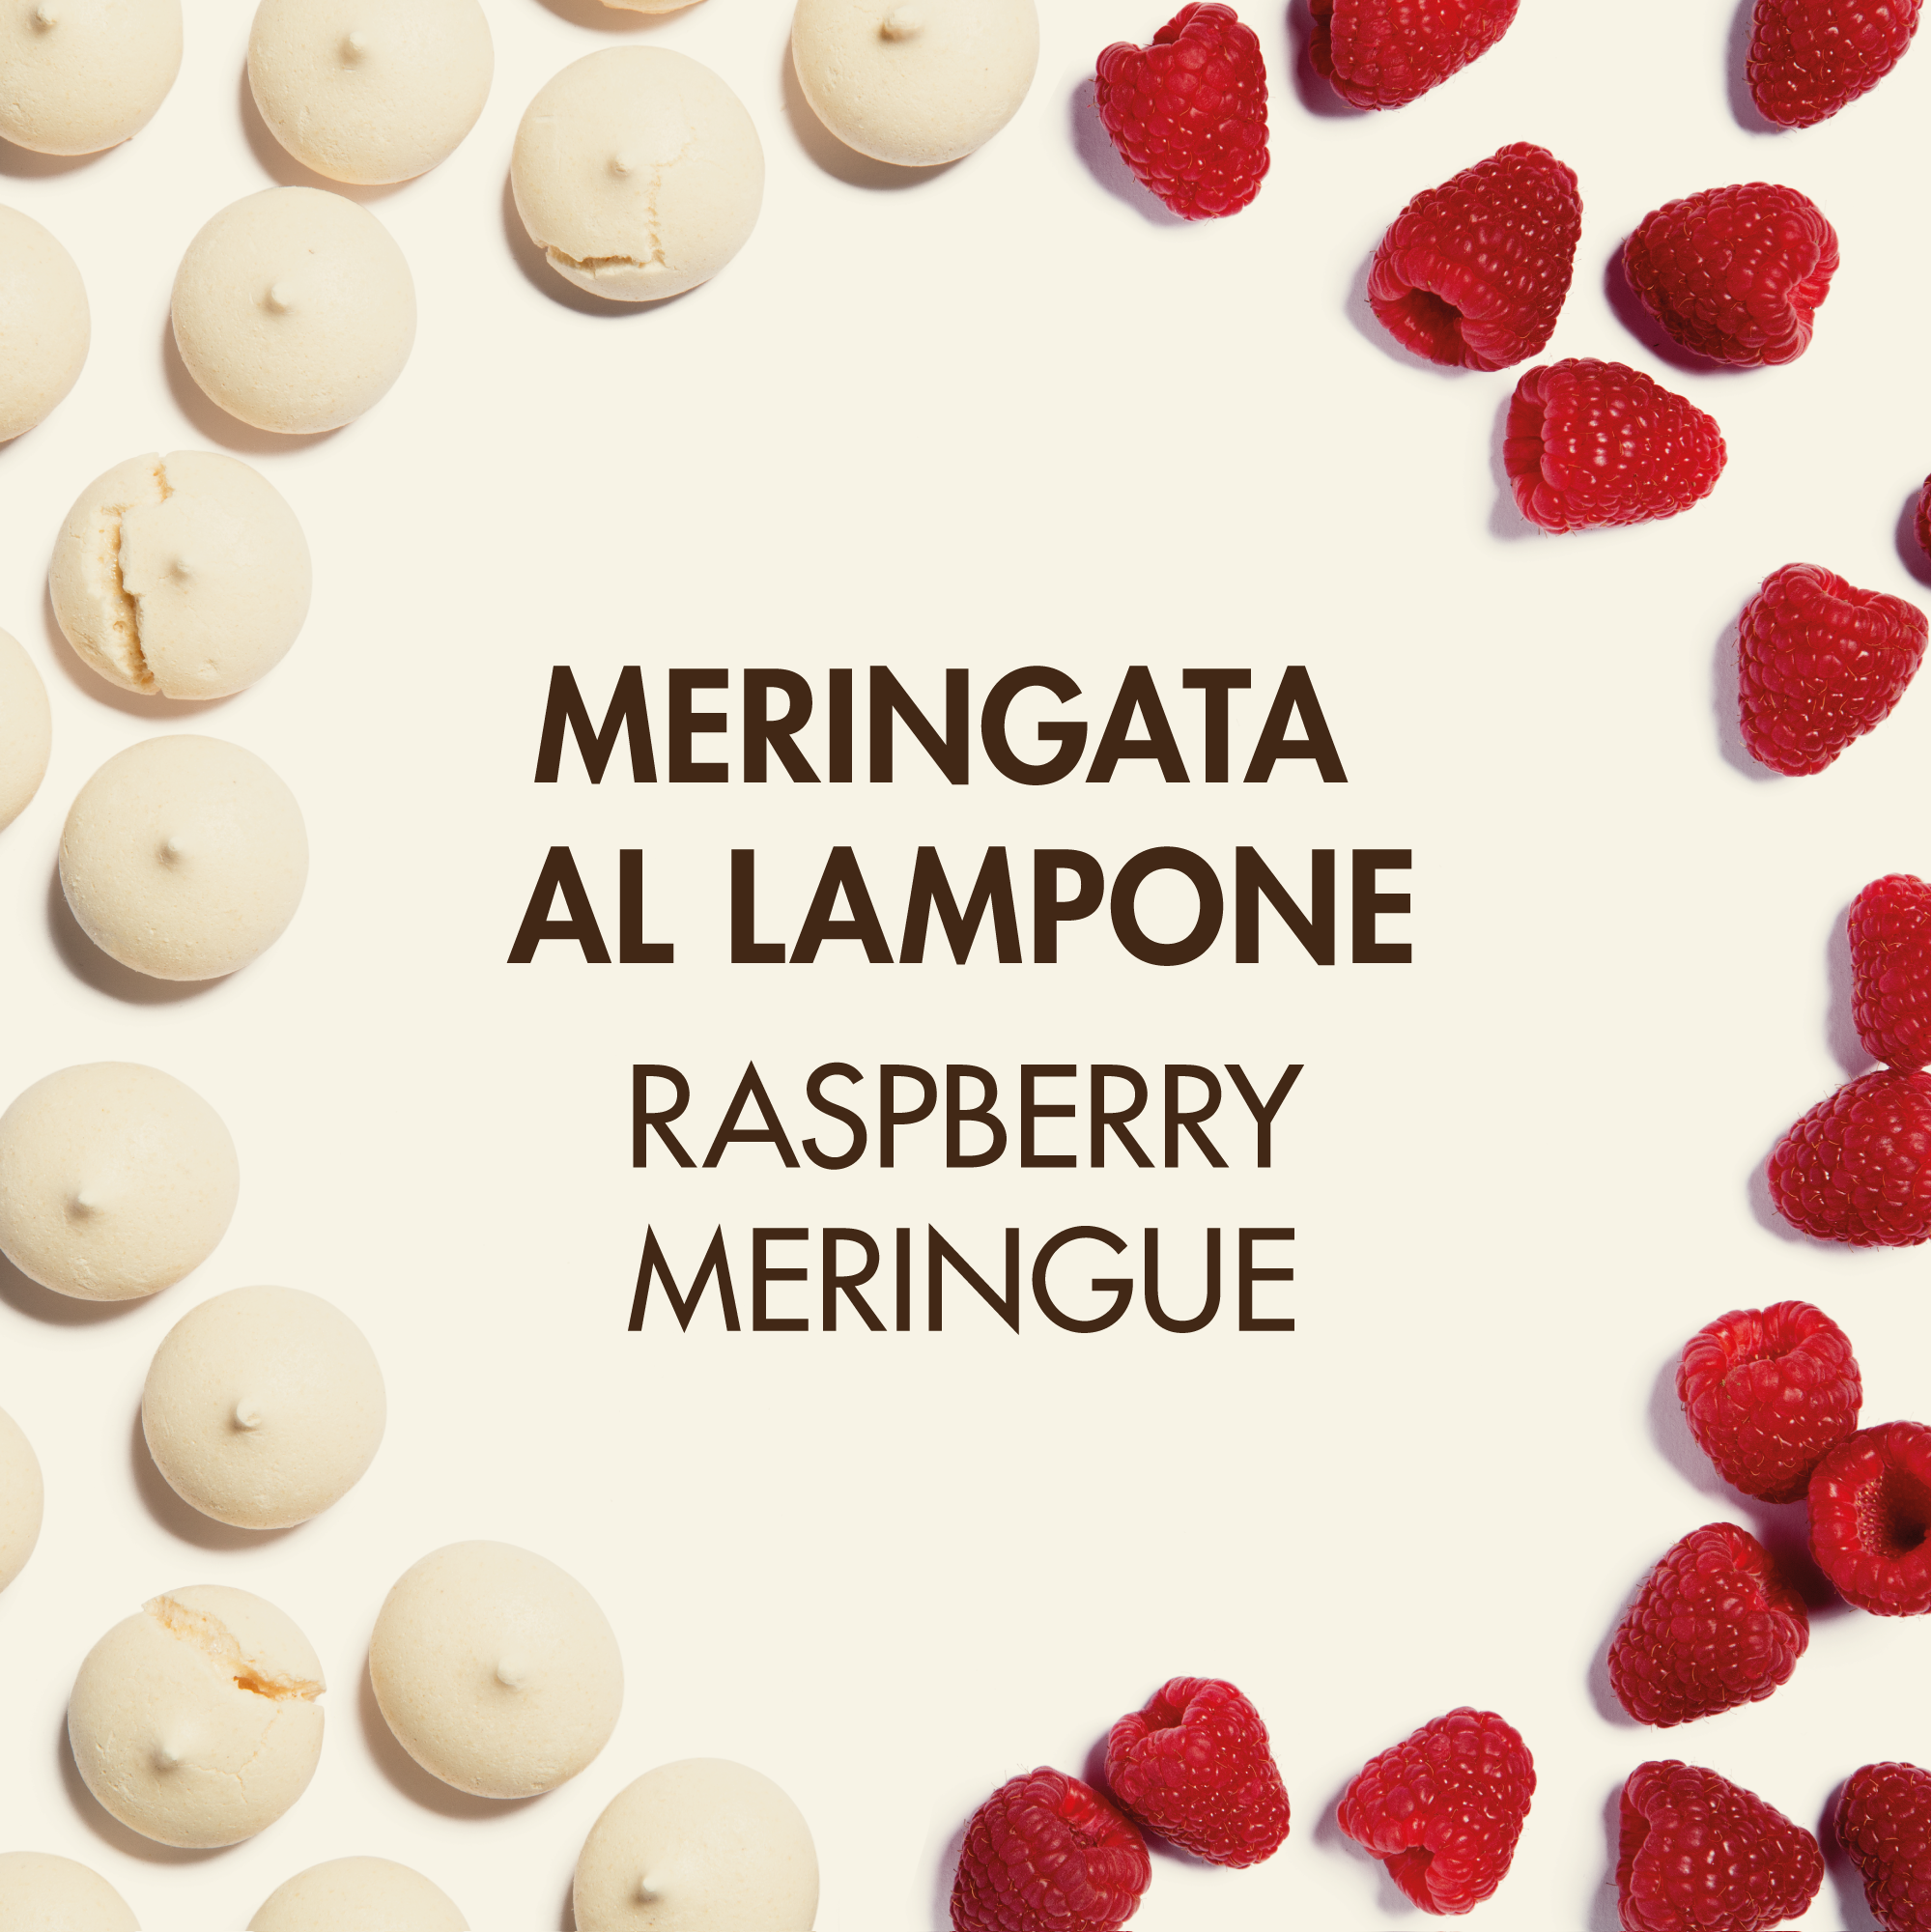 200207_Esecutivi_gusti_scala-1-1_Meringata-al-lampone_ITAENG